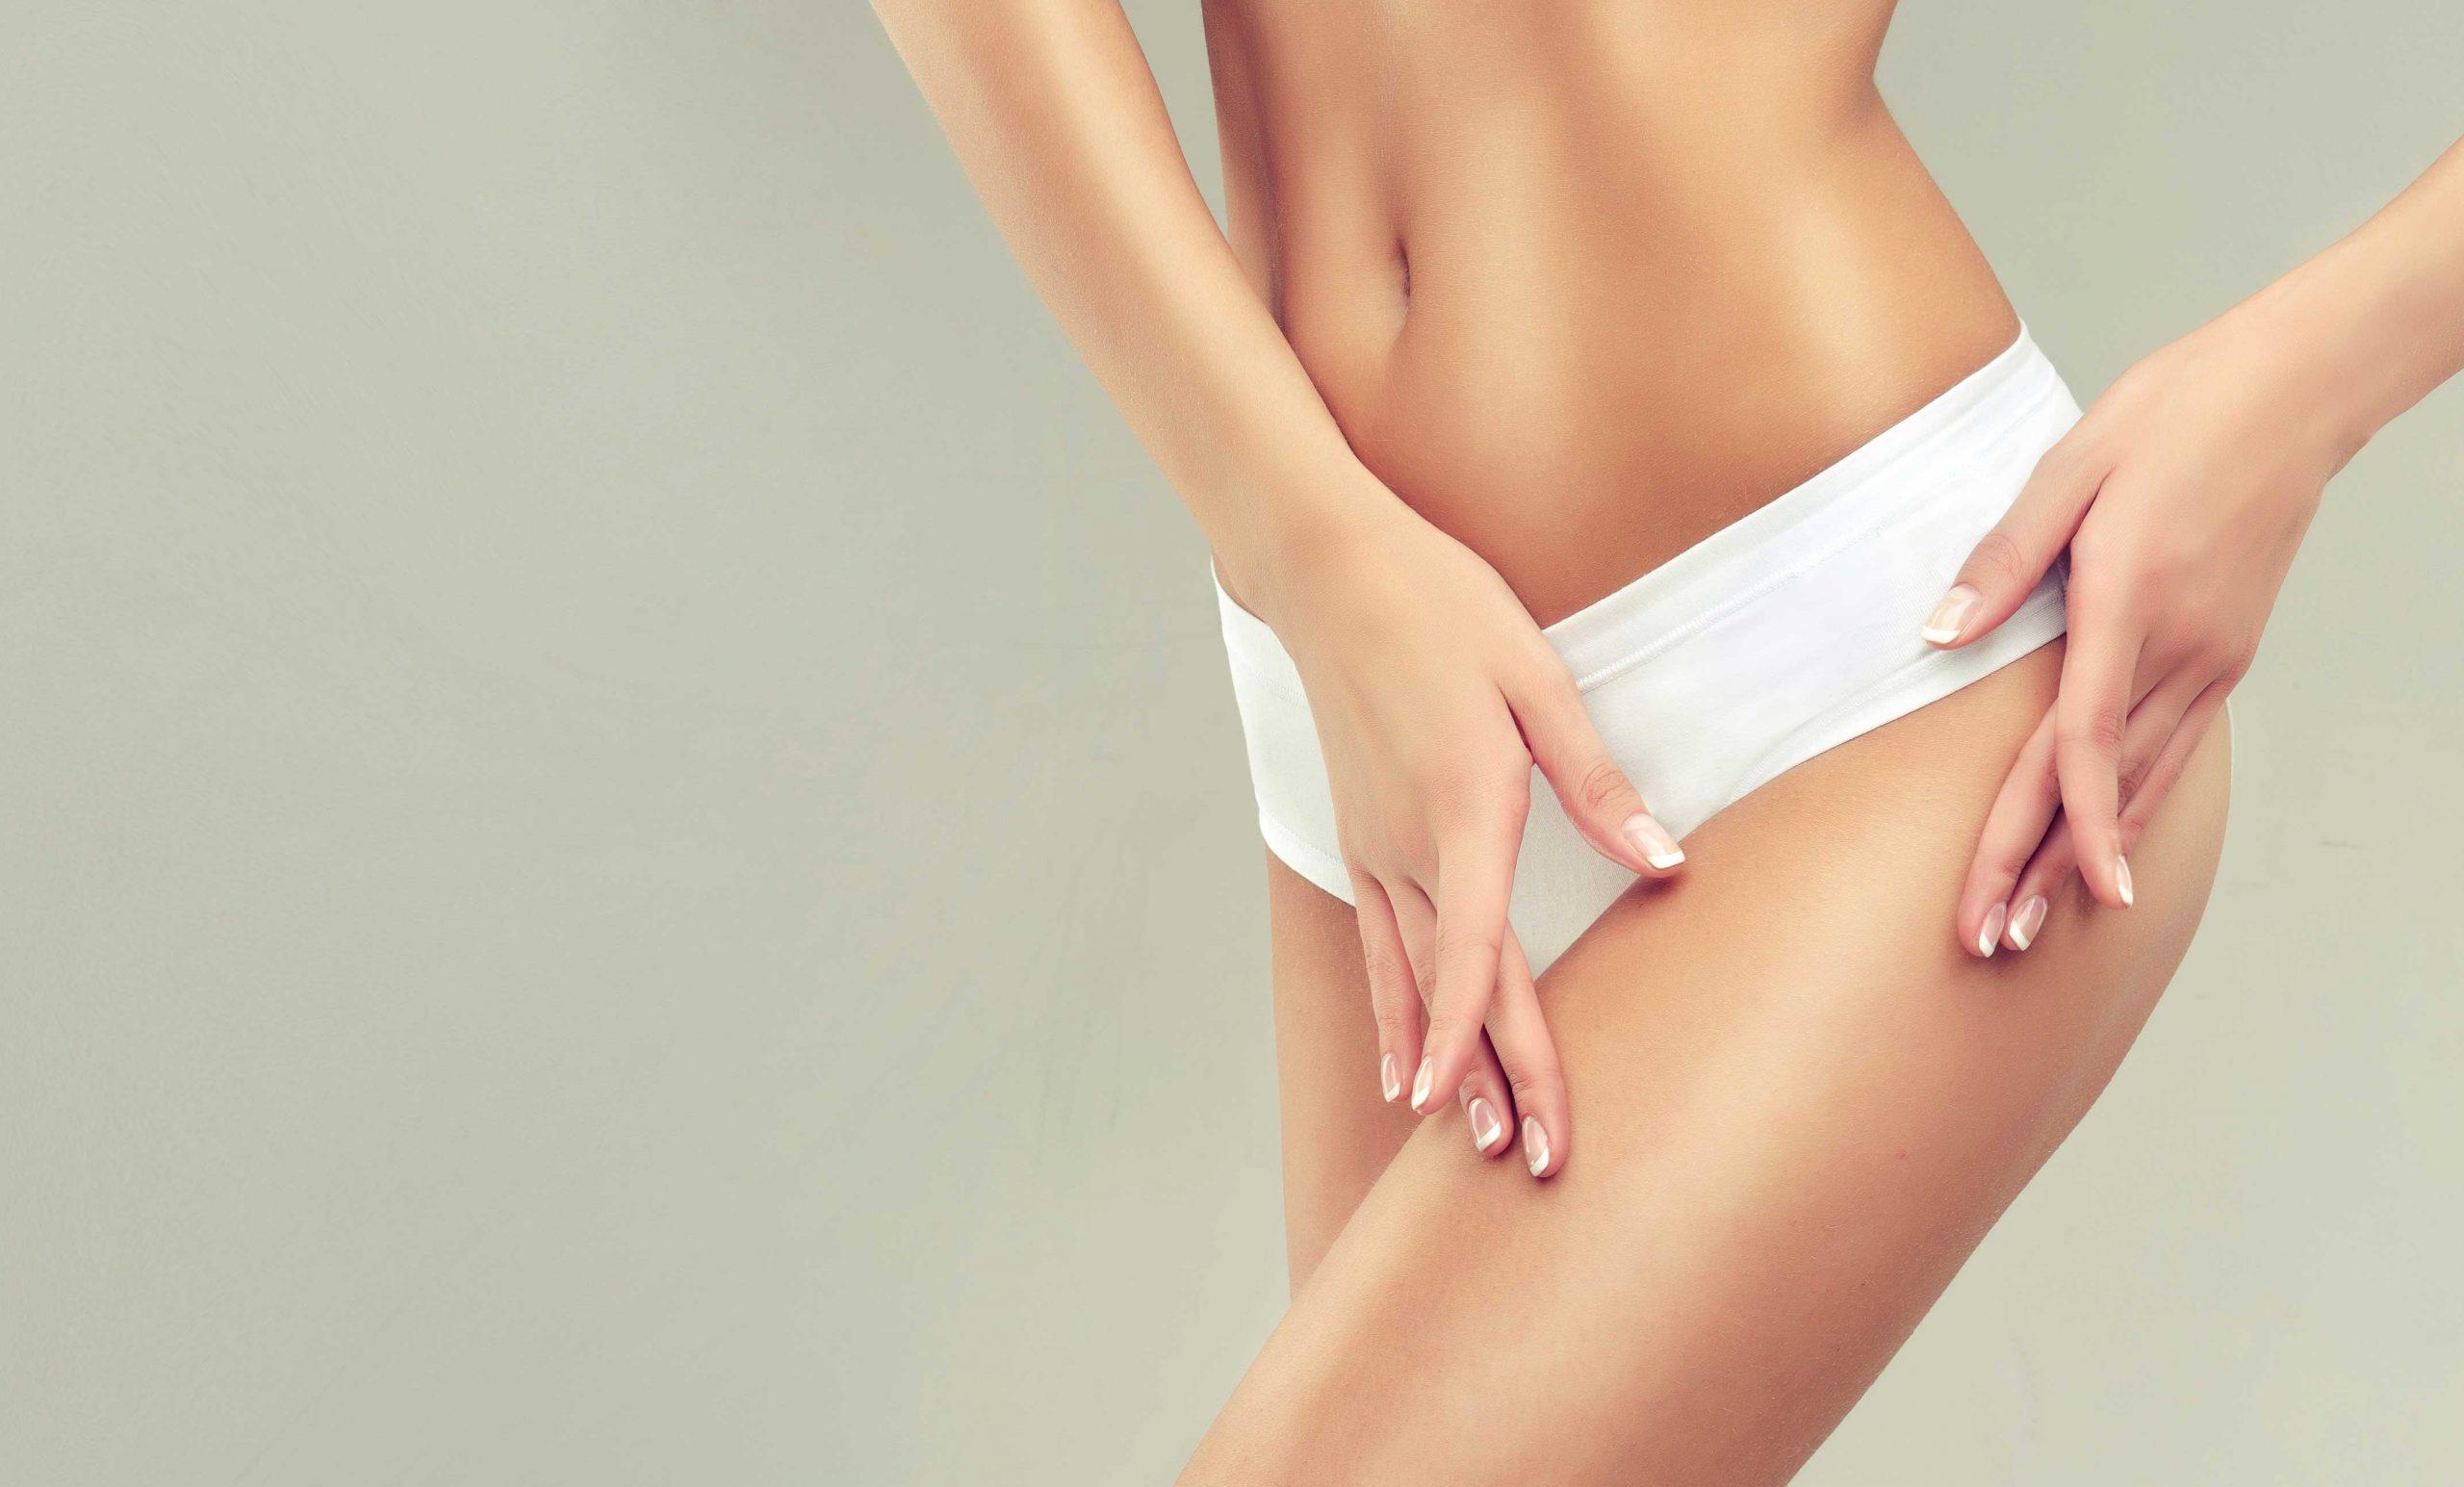 Trockenbürsten Gegen Cellulite